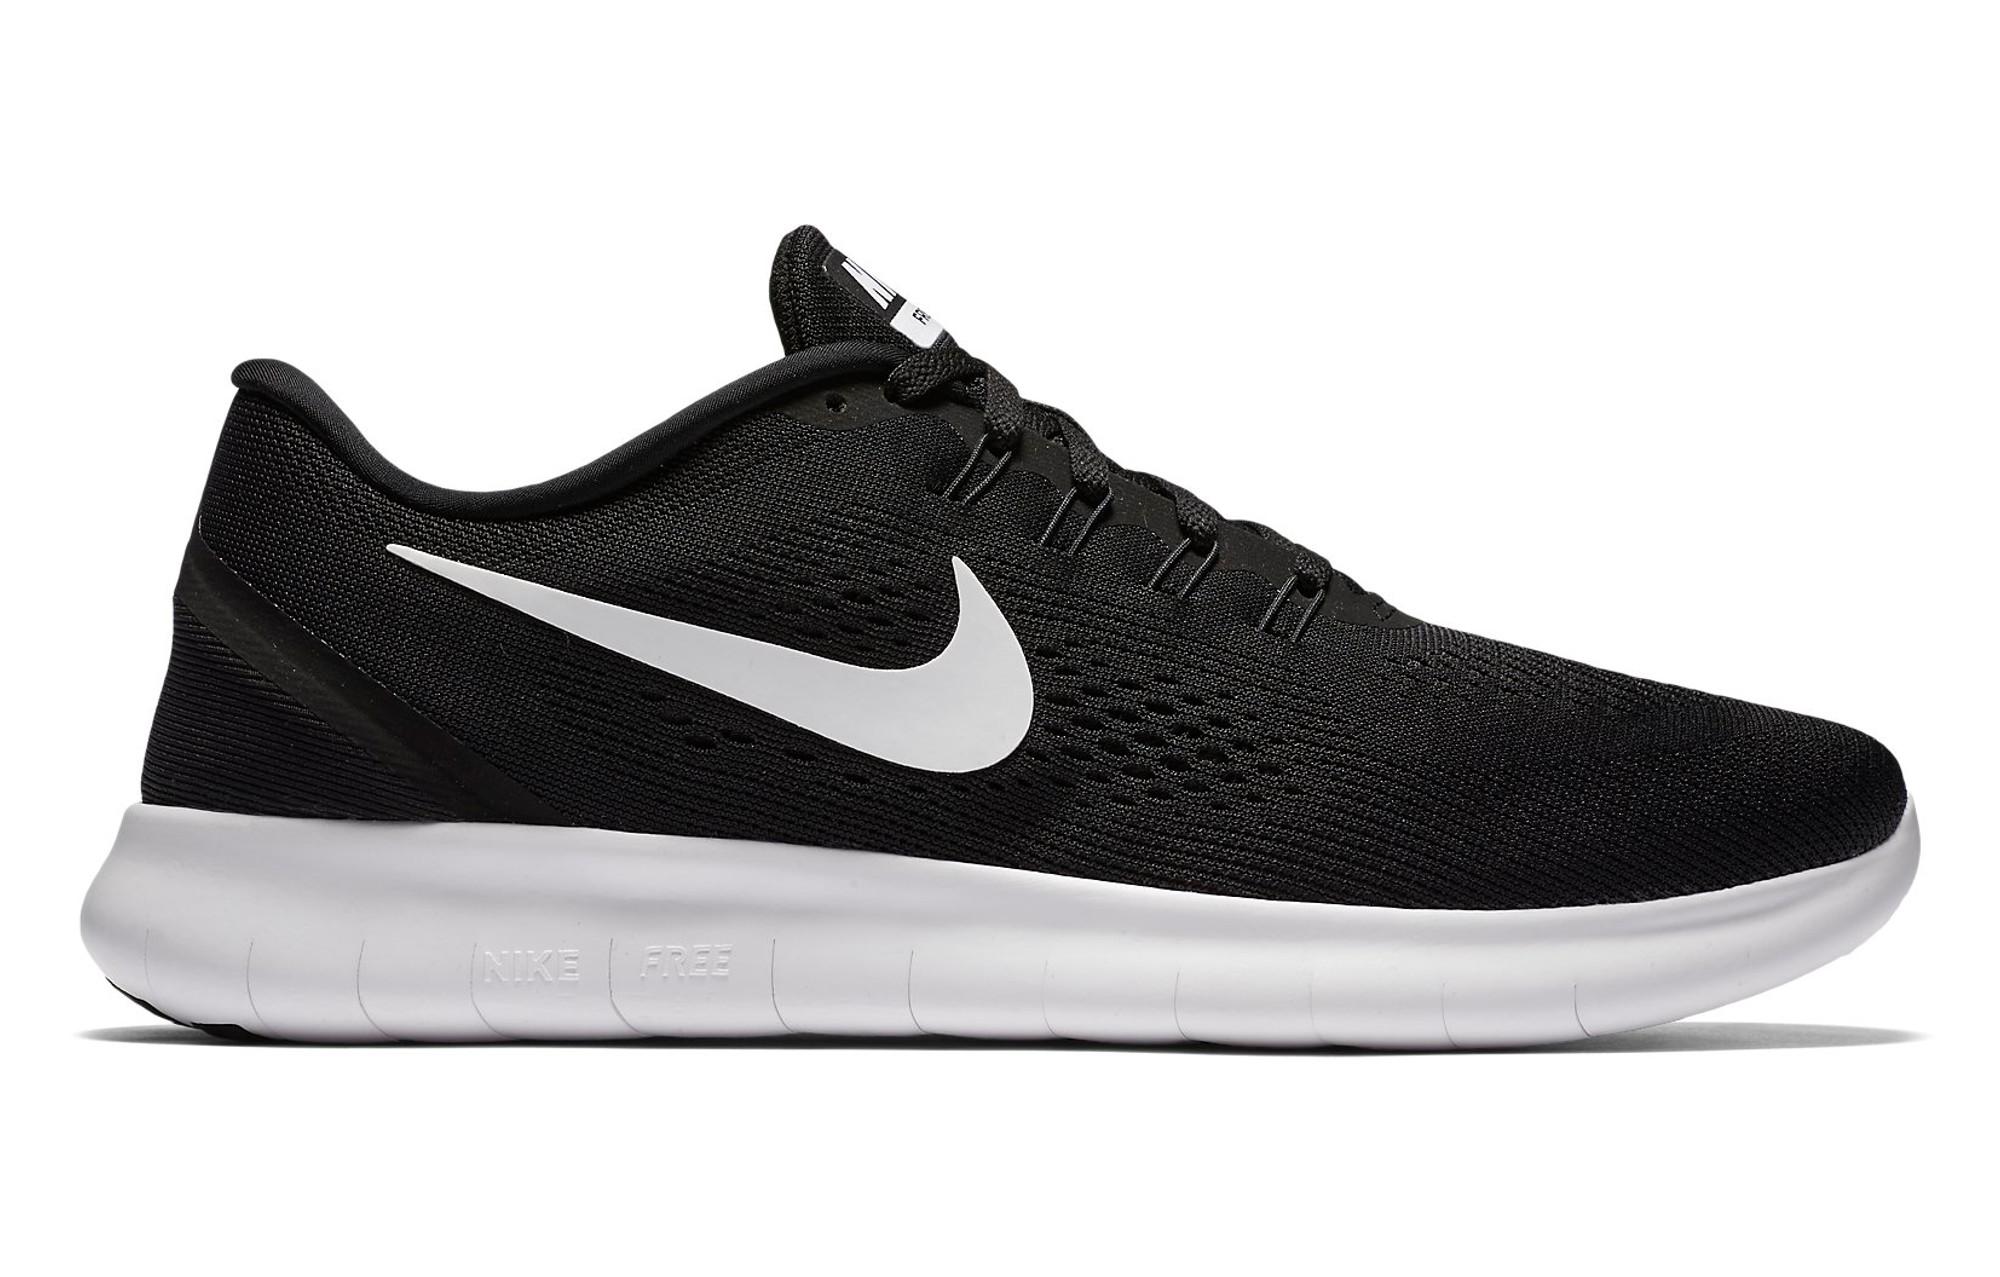 Free Chaussures Rn De Nike Noir Running 2WEDHI9